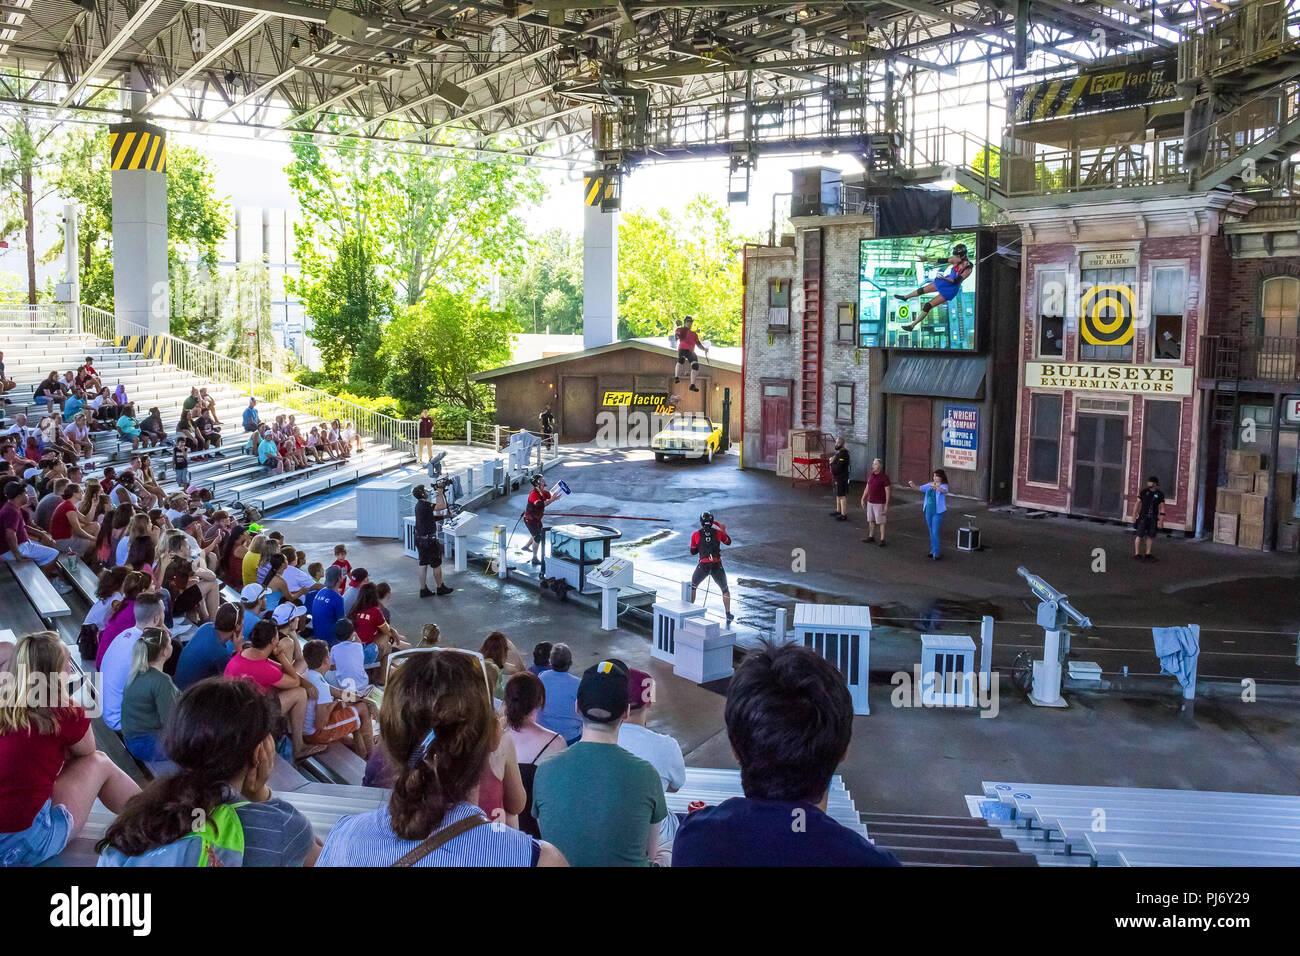 Map Of Universal Studios Florida.Orlando Florida Usa May 10 2018 The People At Park Universal